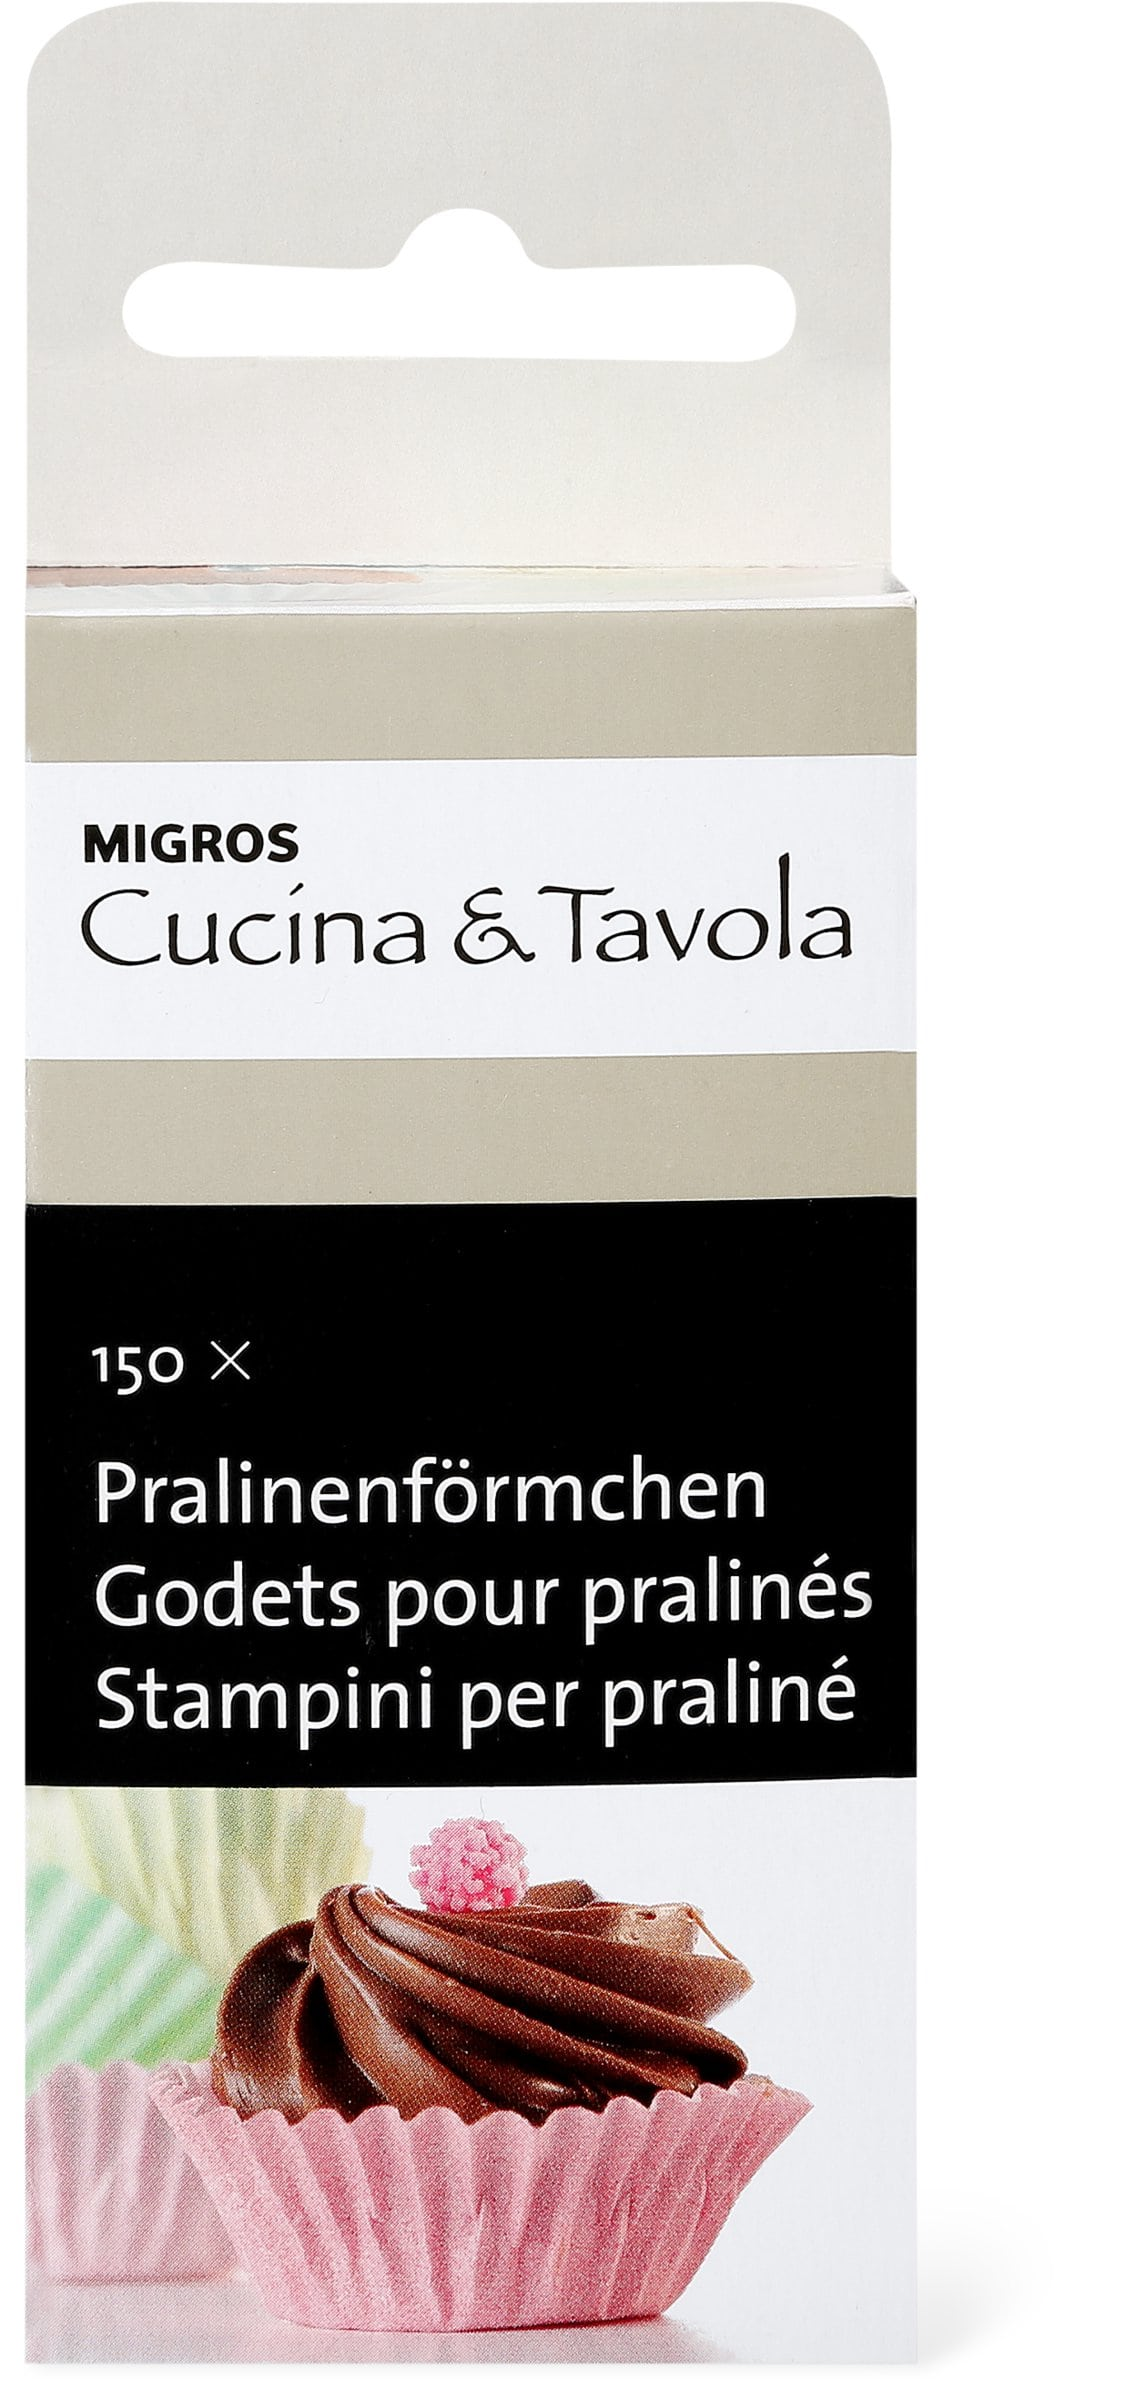 Cucina & Tavola Pralinenförmchen